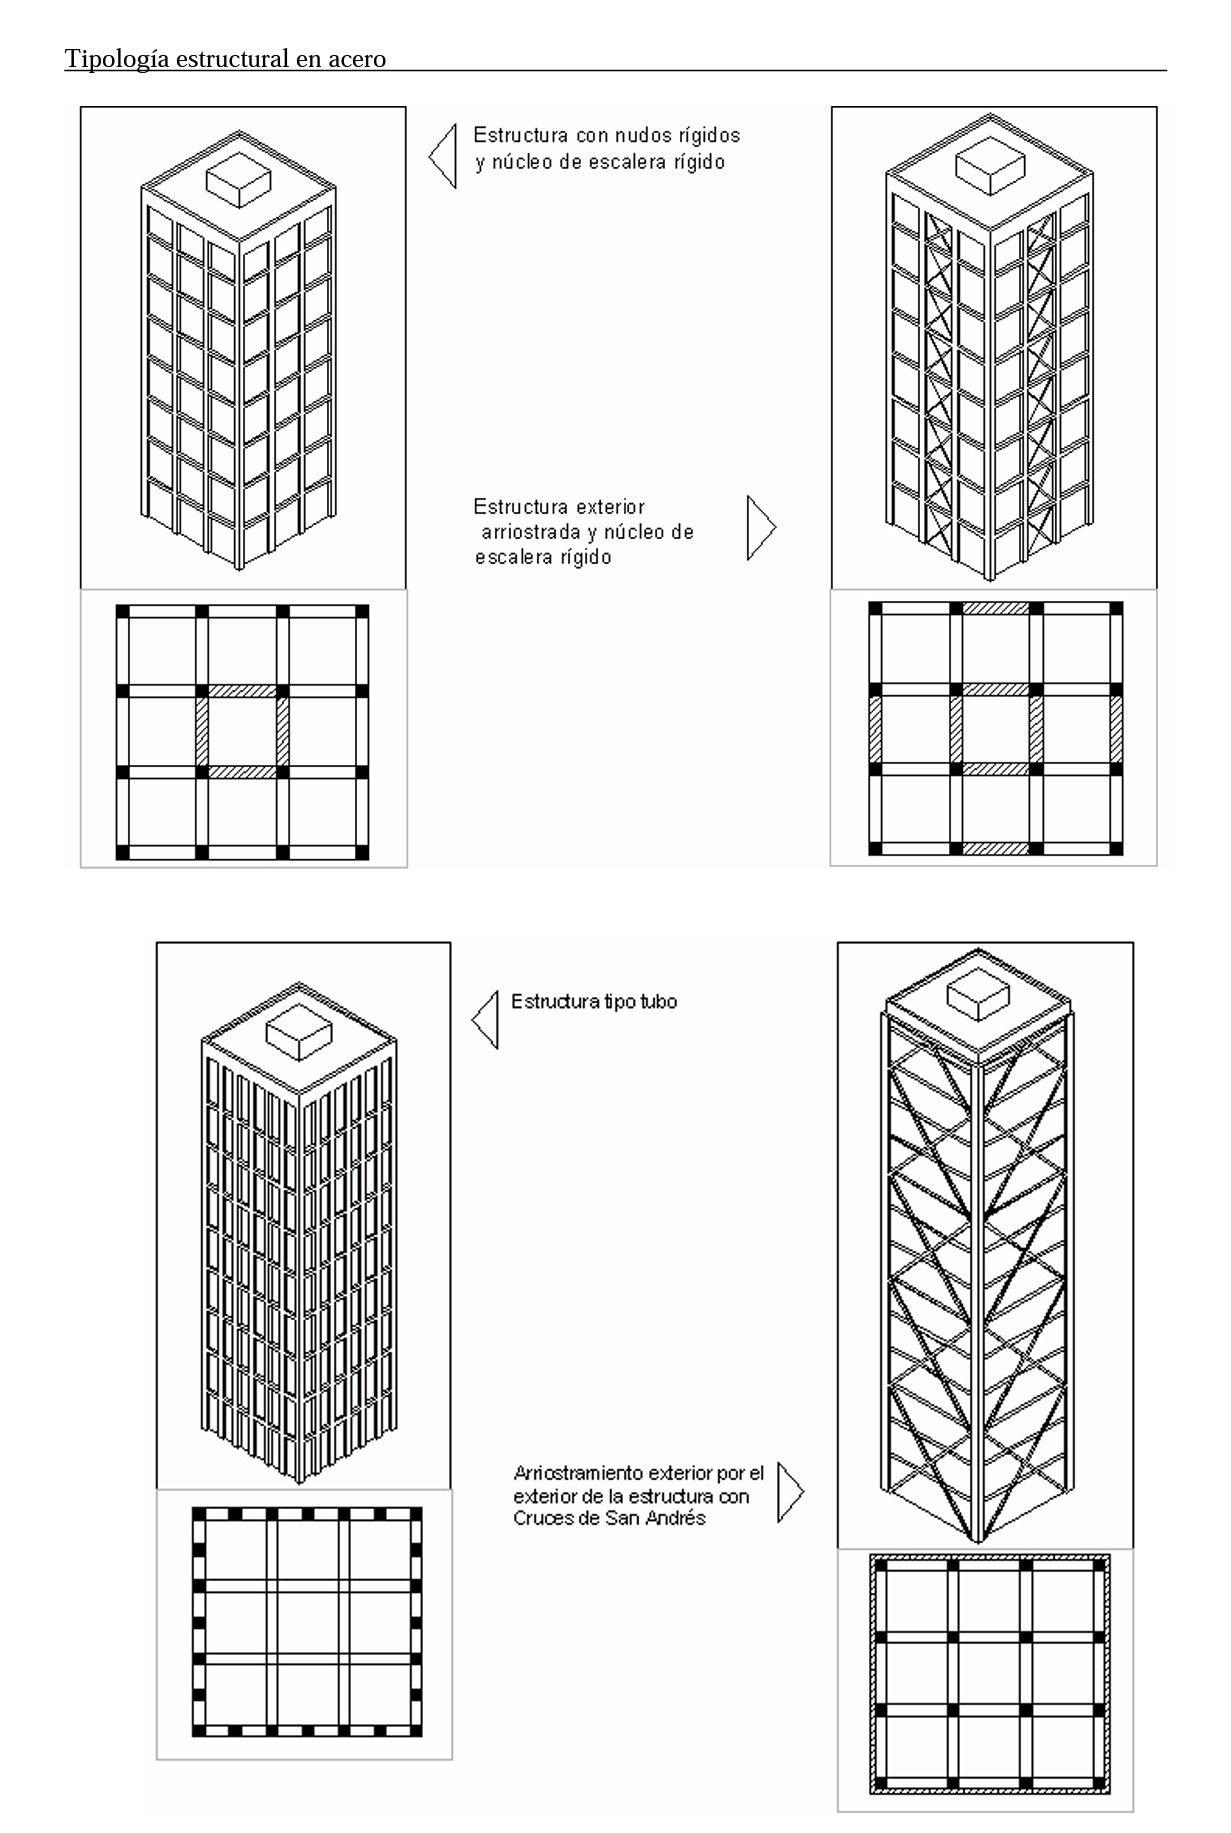 Tipología estructural en acero   TST   Pinterest   Acero ...